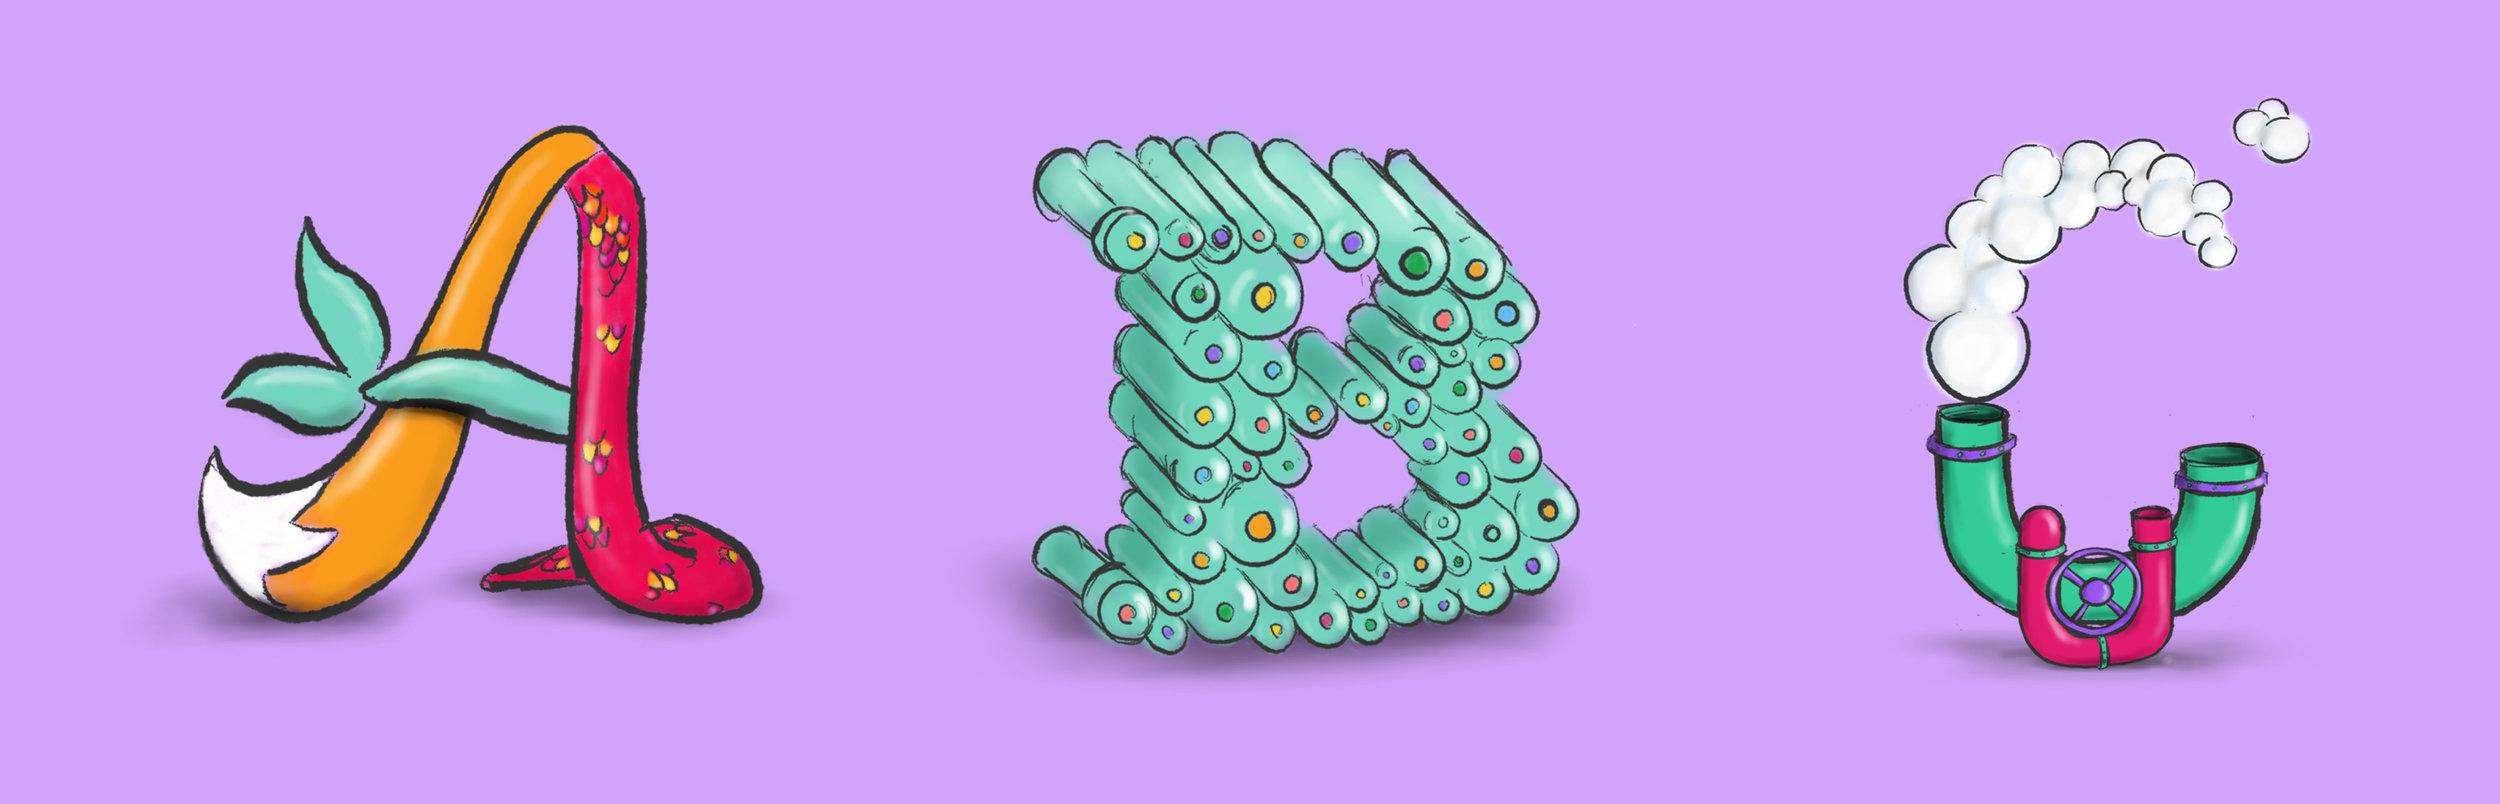 Sketch concepts of alphabet by Noah Camp